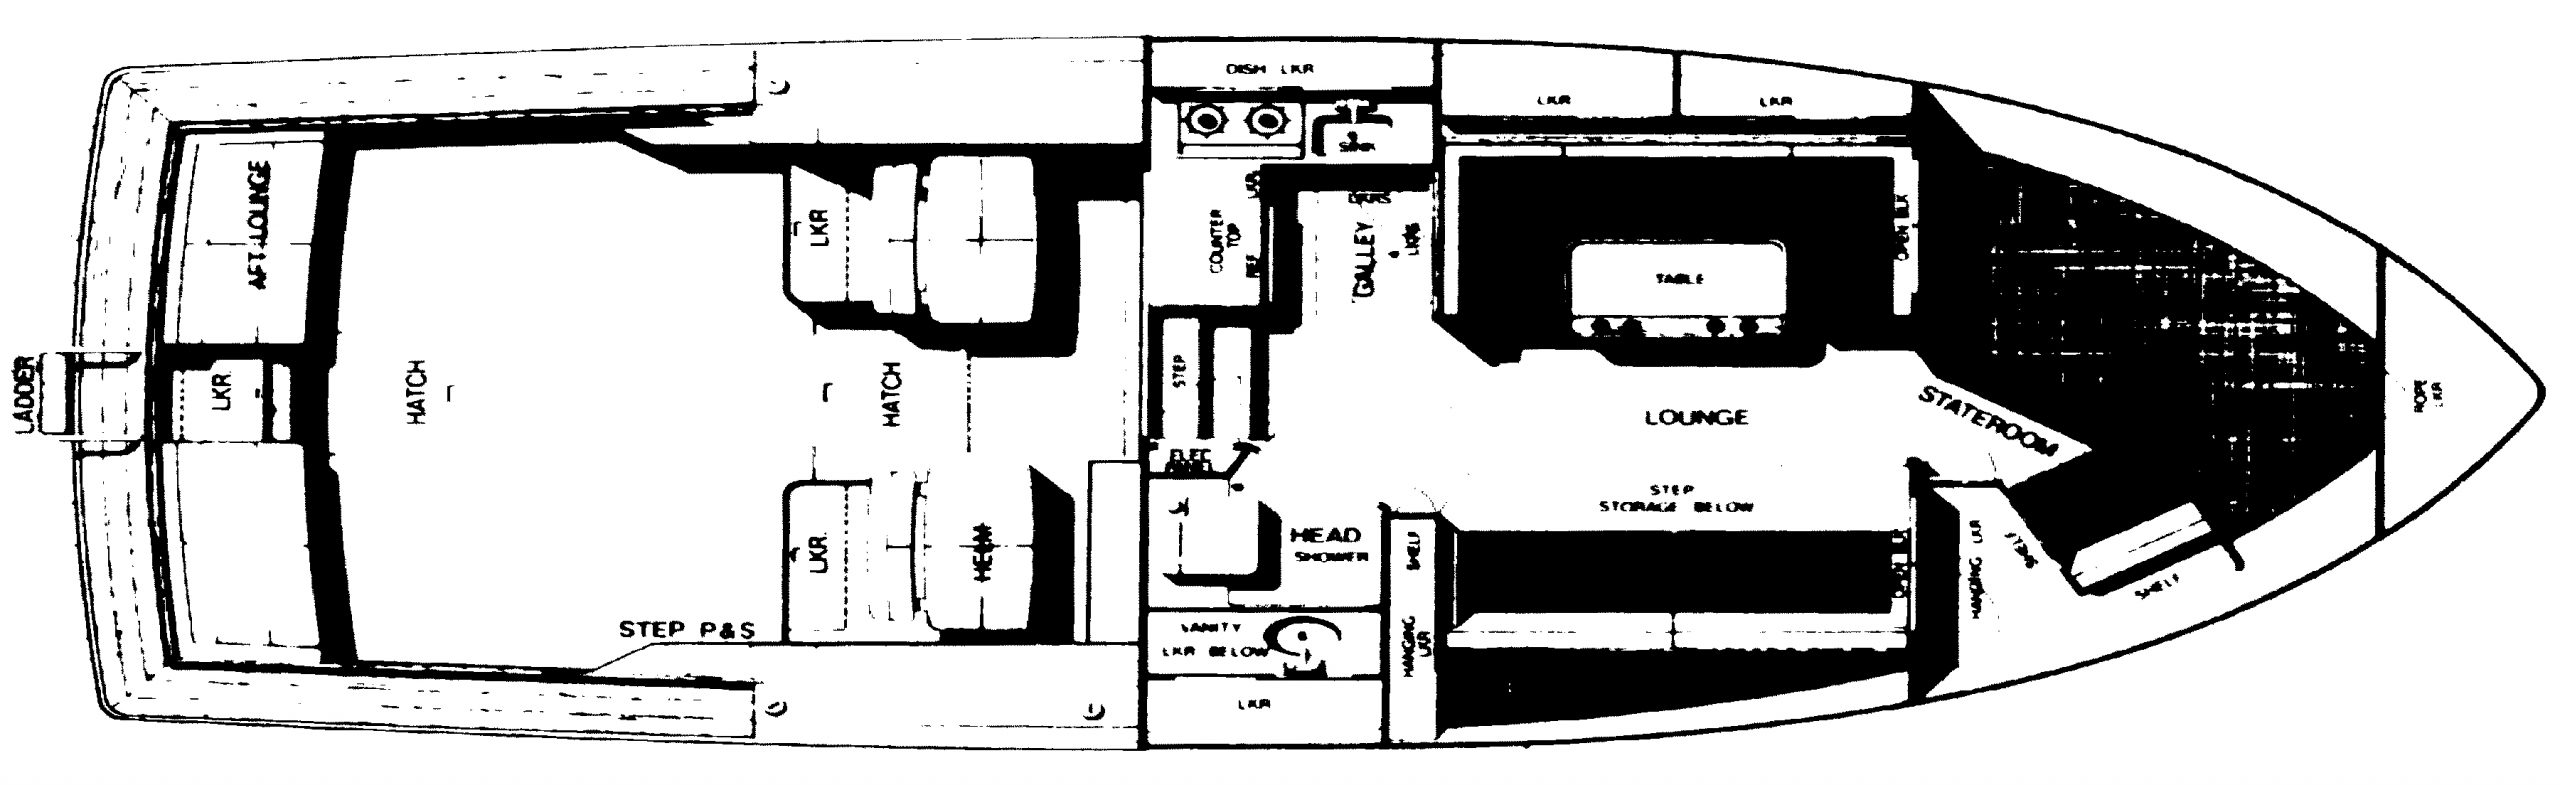 31 SC Express Floor Plan 2